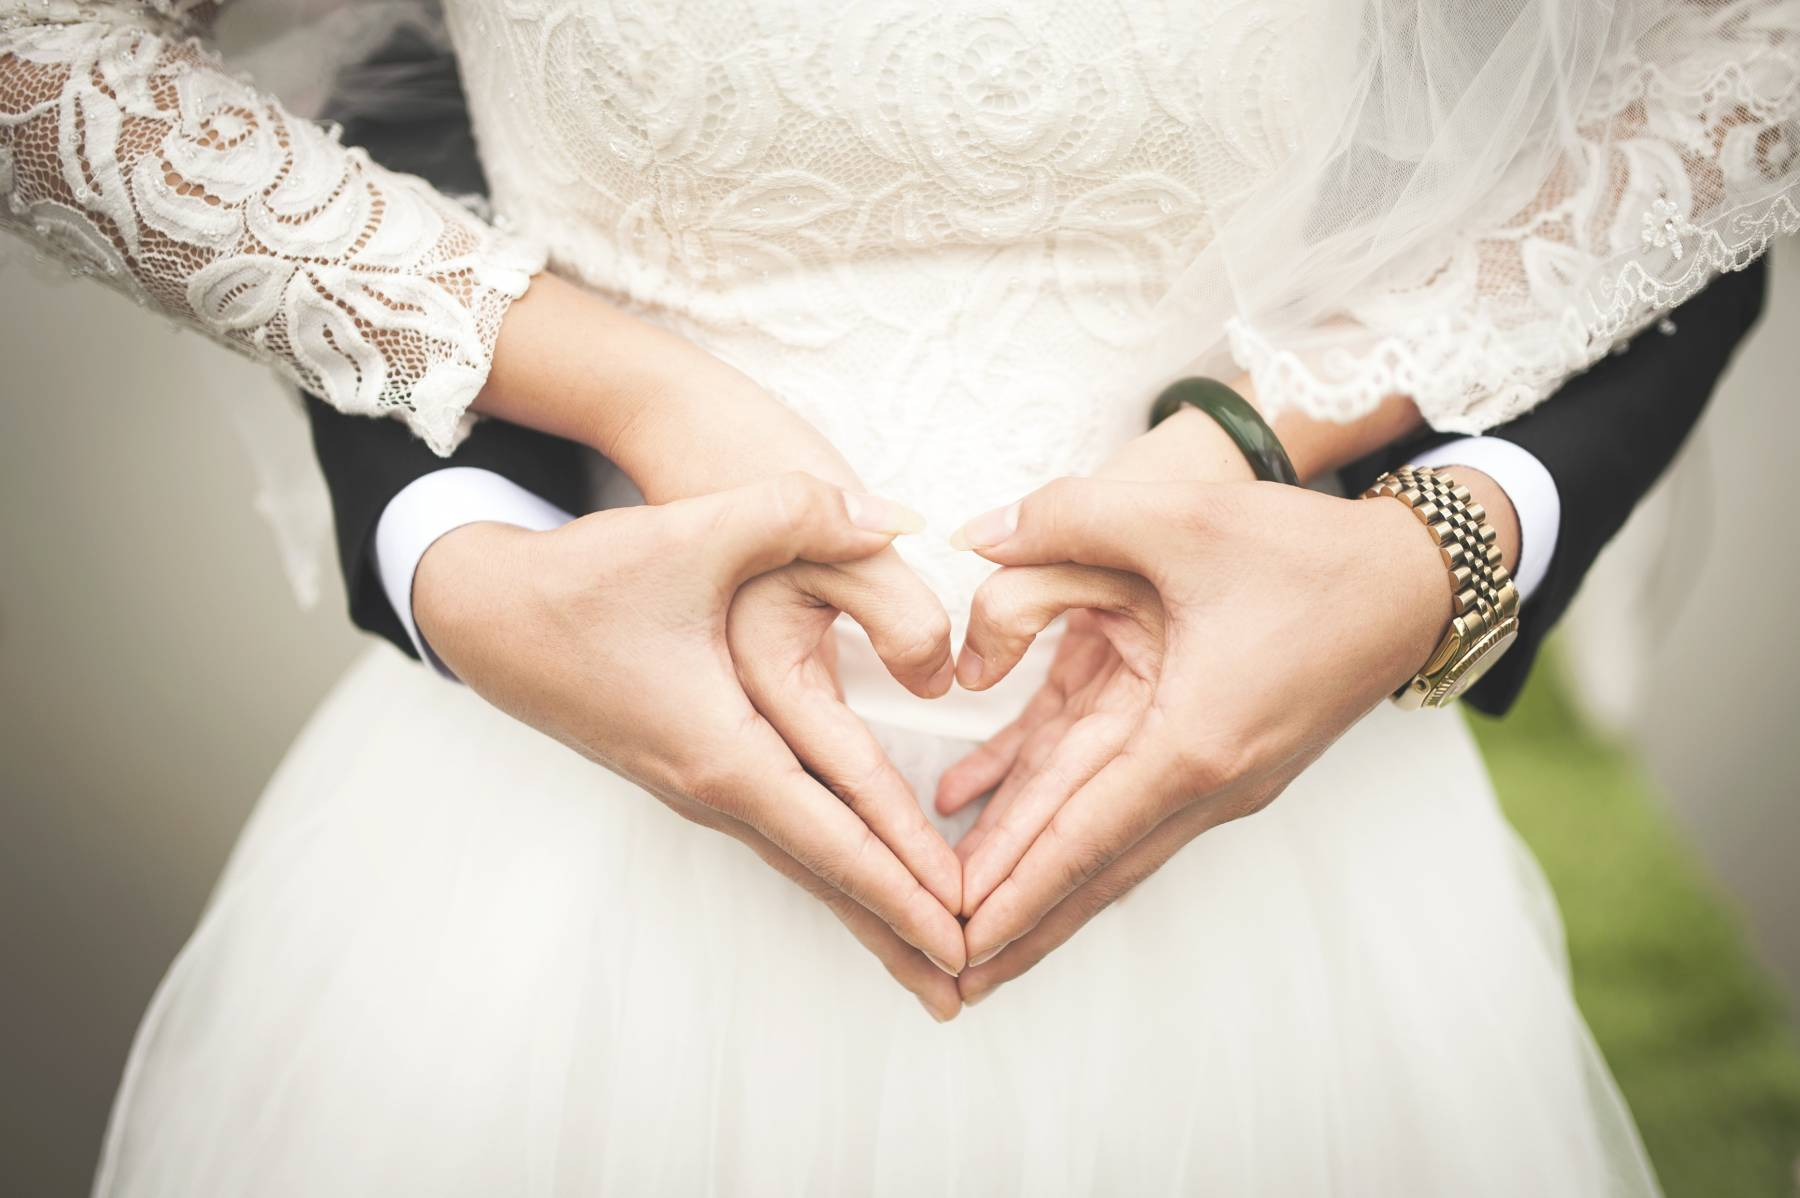 seasons-greetings-why-winter-weddings-make-sense